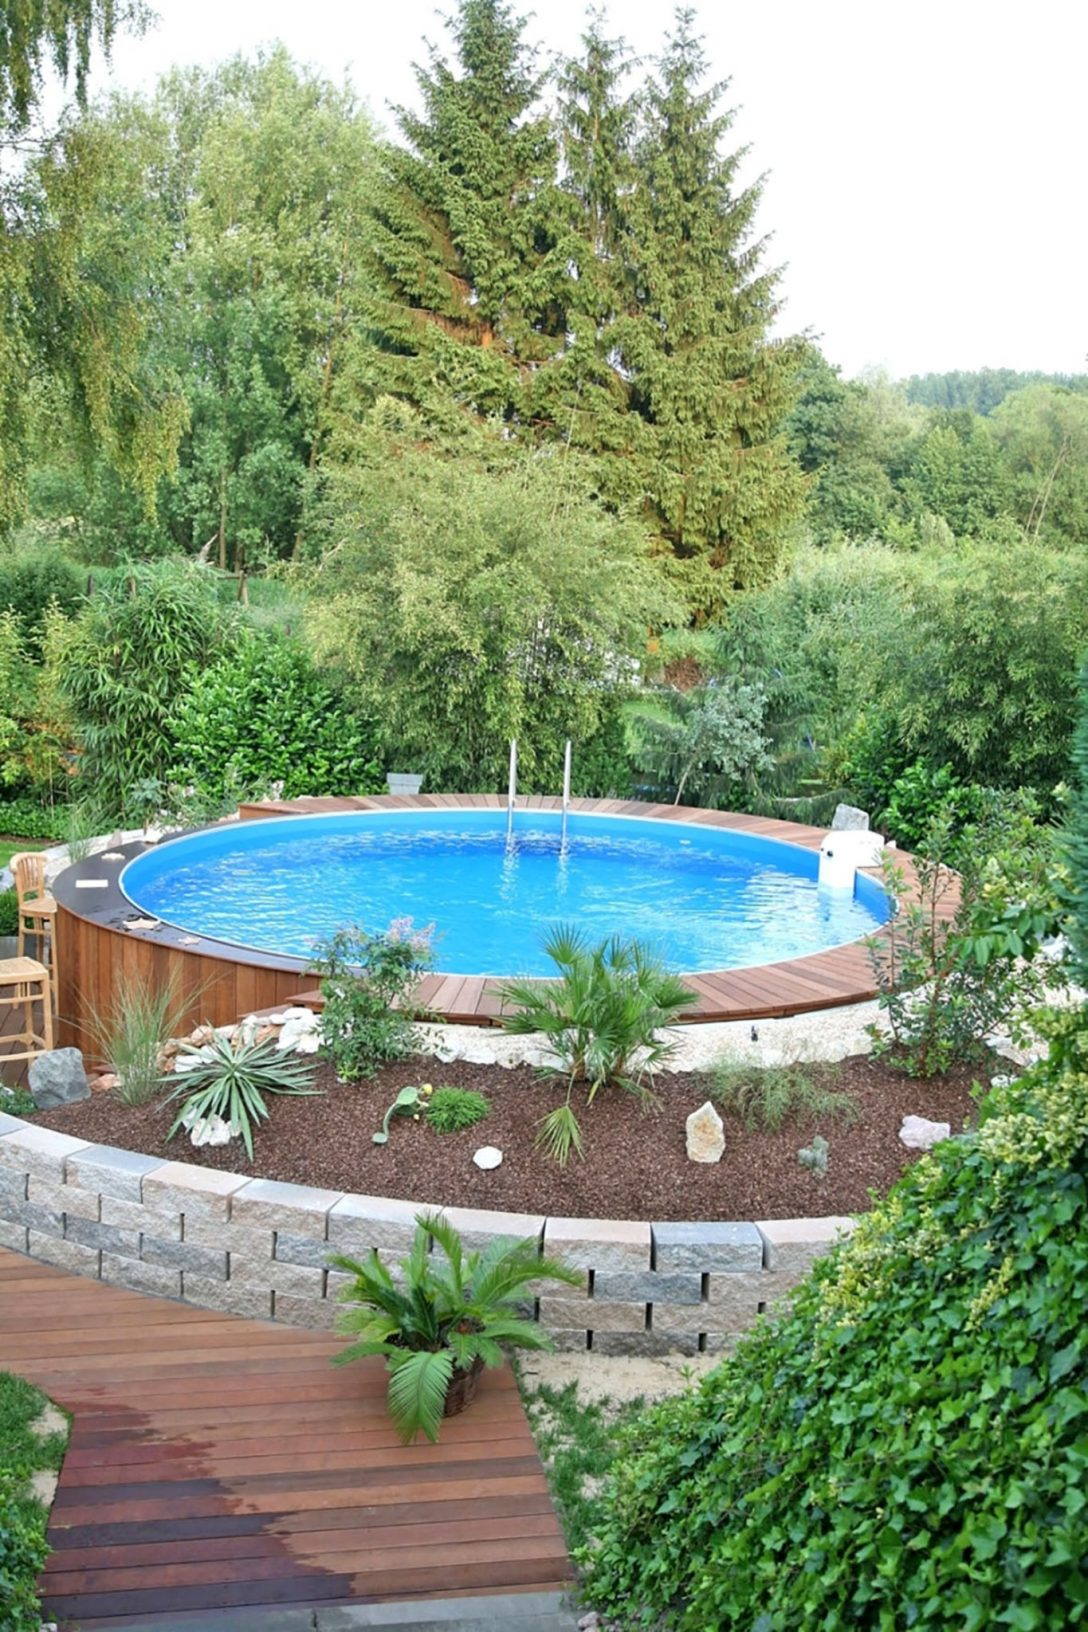 Full Size of Gartenpool Rechteckig Pool Garten Baugenehmigung Swimmingpool Hessen Kosten Im Nrw Holz Wohnzimmer Gartenpool Rechteckig